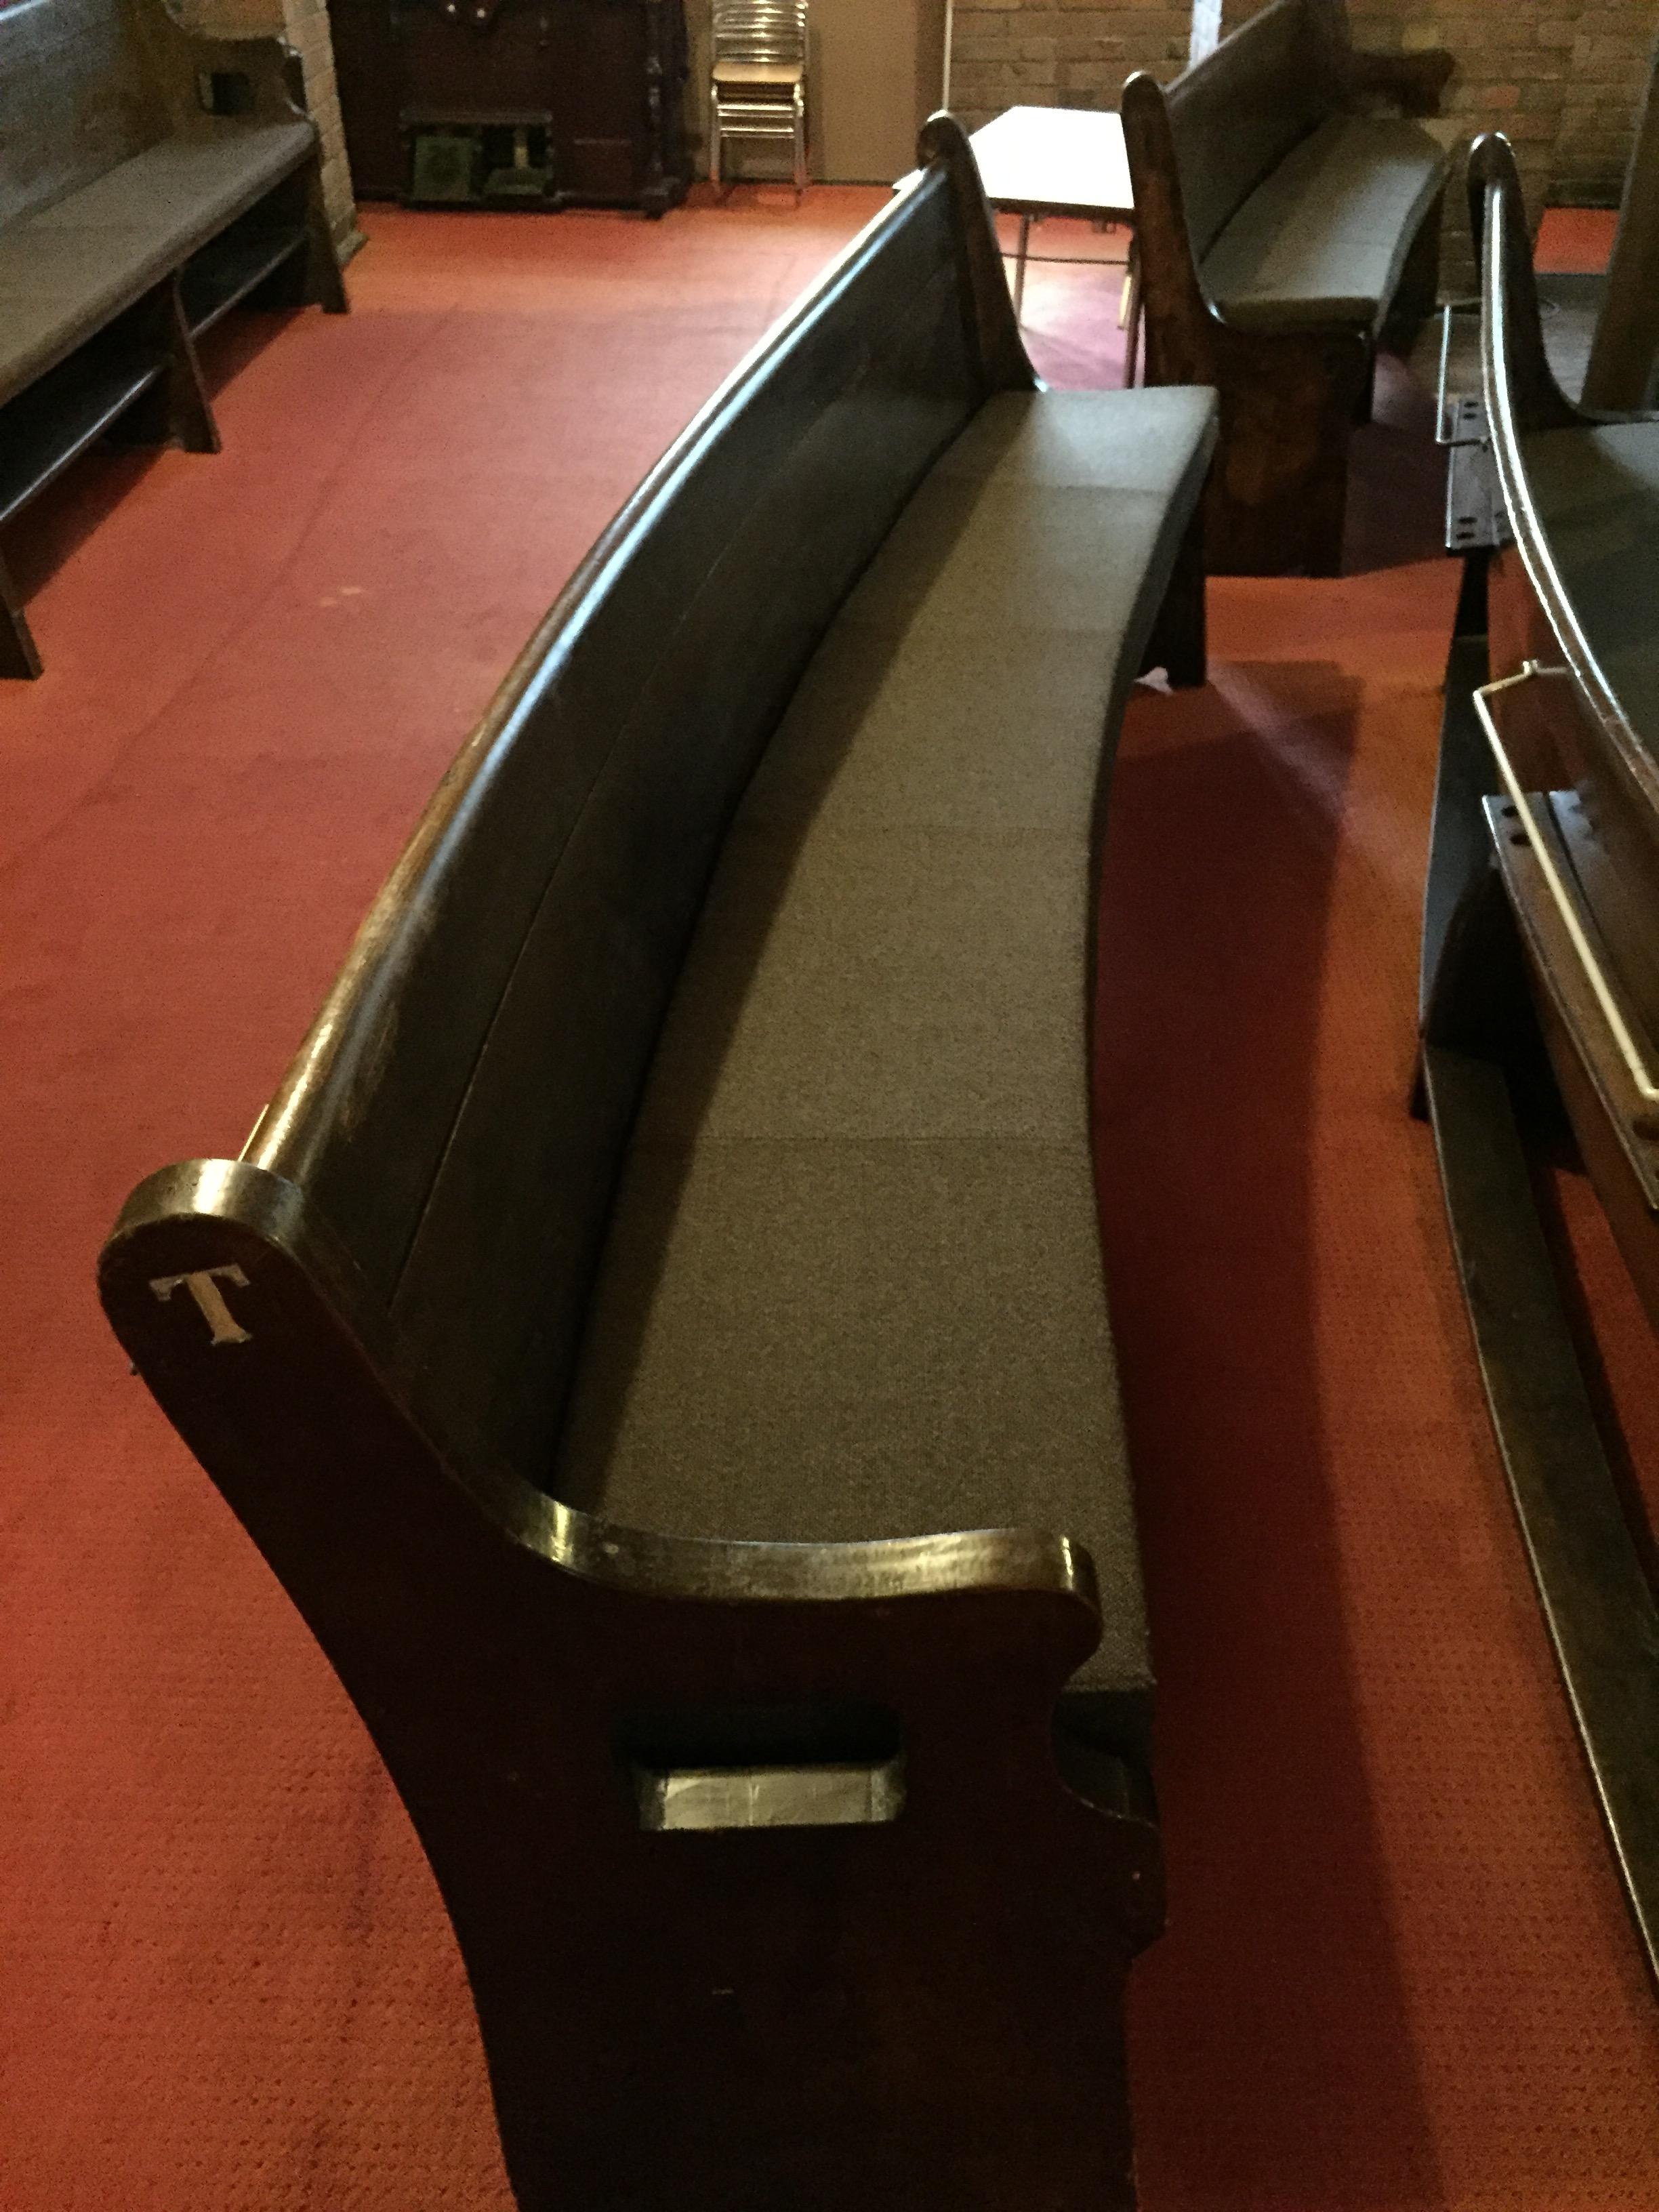 <p>礼拝堂長椅子</p>曲線でデザインされた礼拝堂の長椅子。